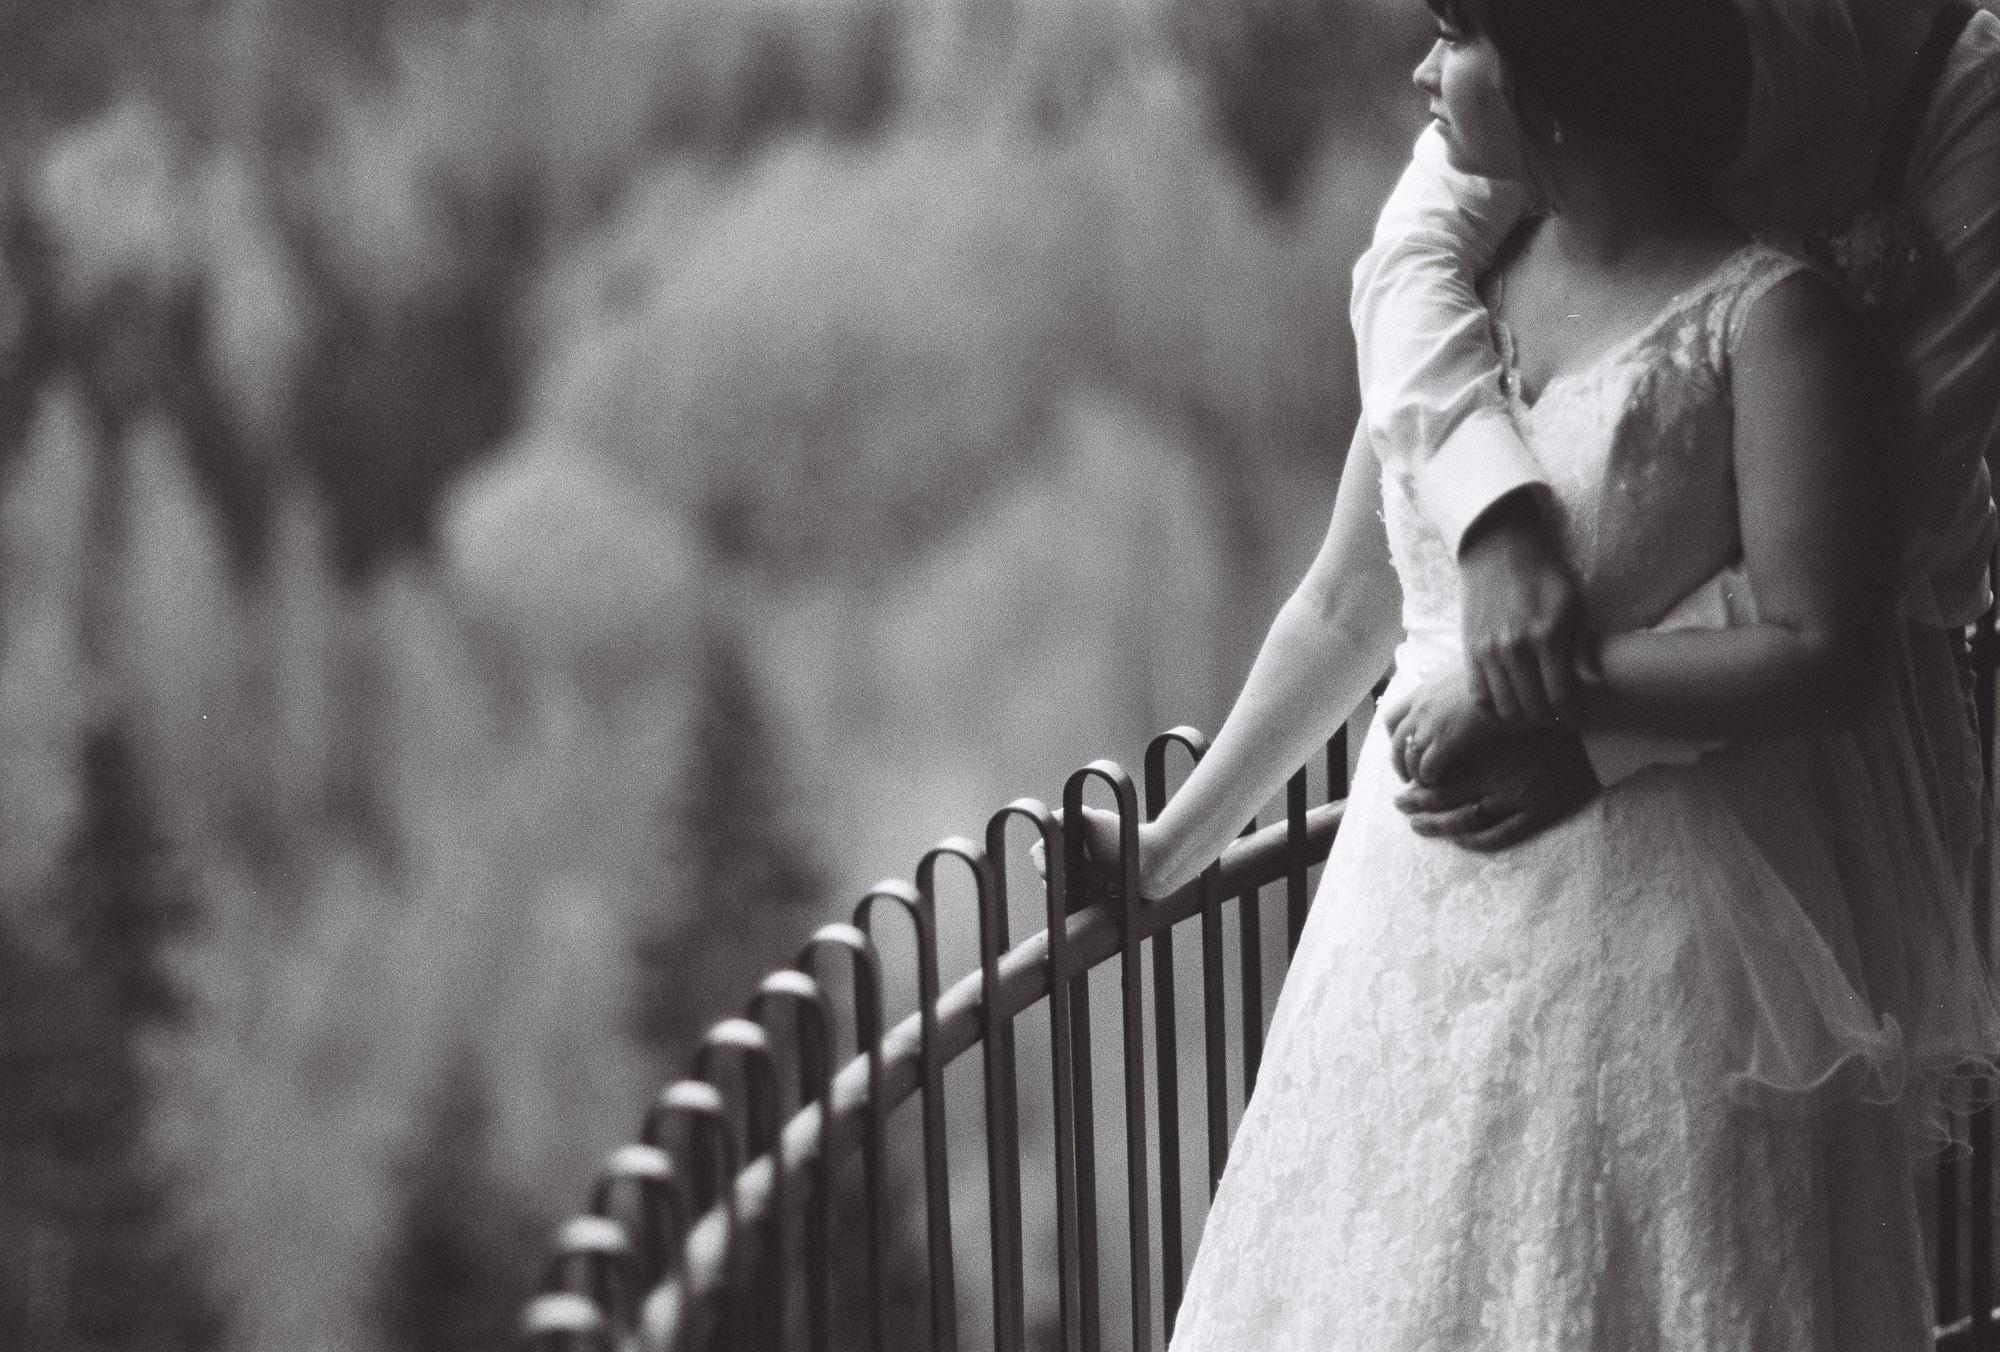 jere-satamo-analog-film-wedding-photographer-finland-134.jpg